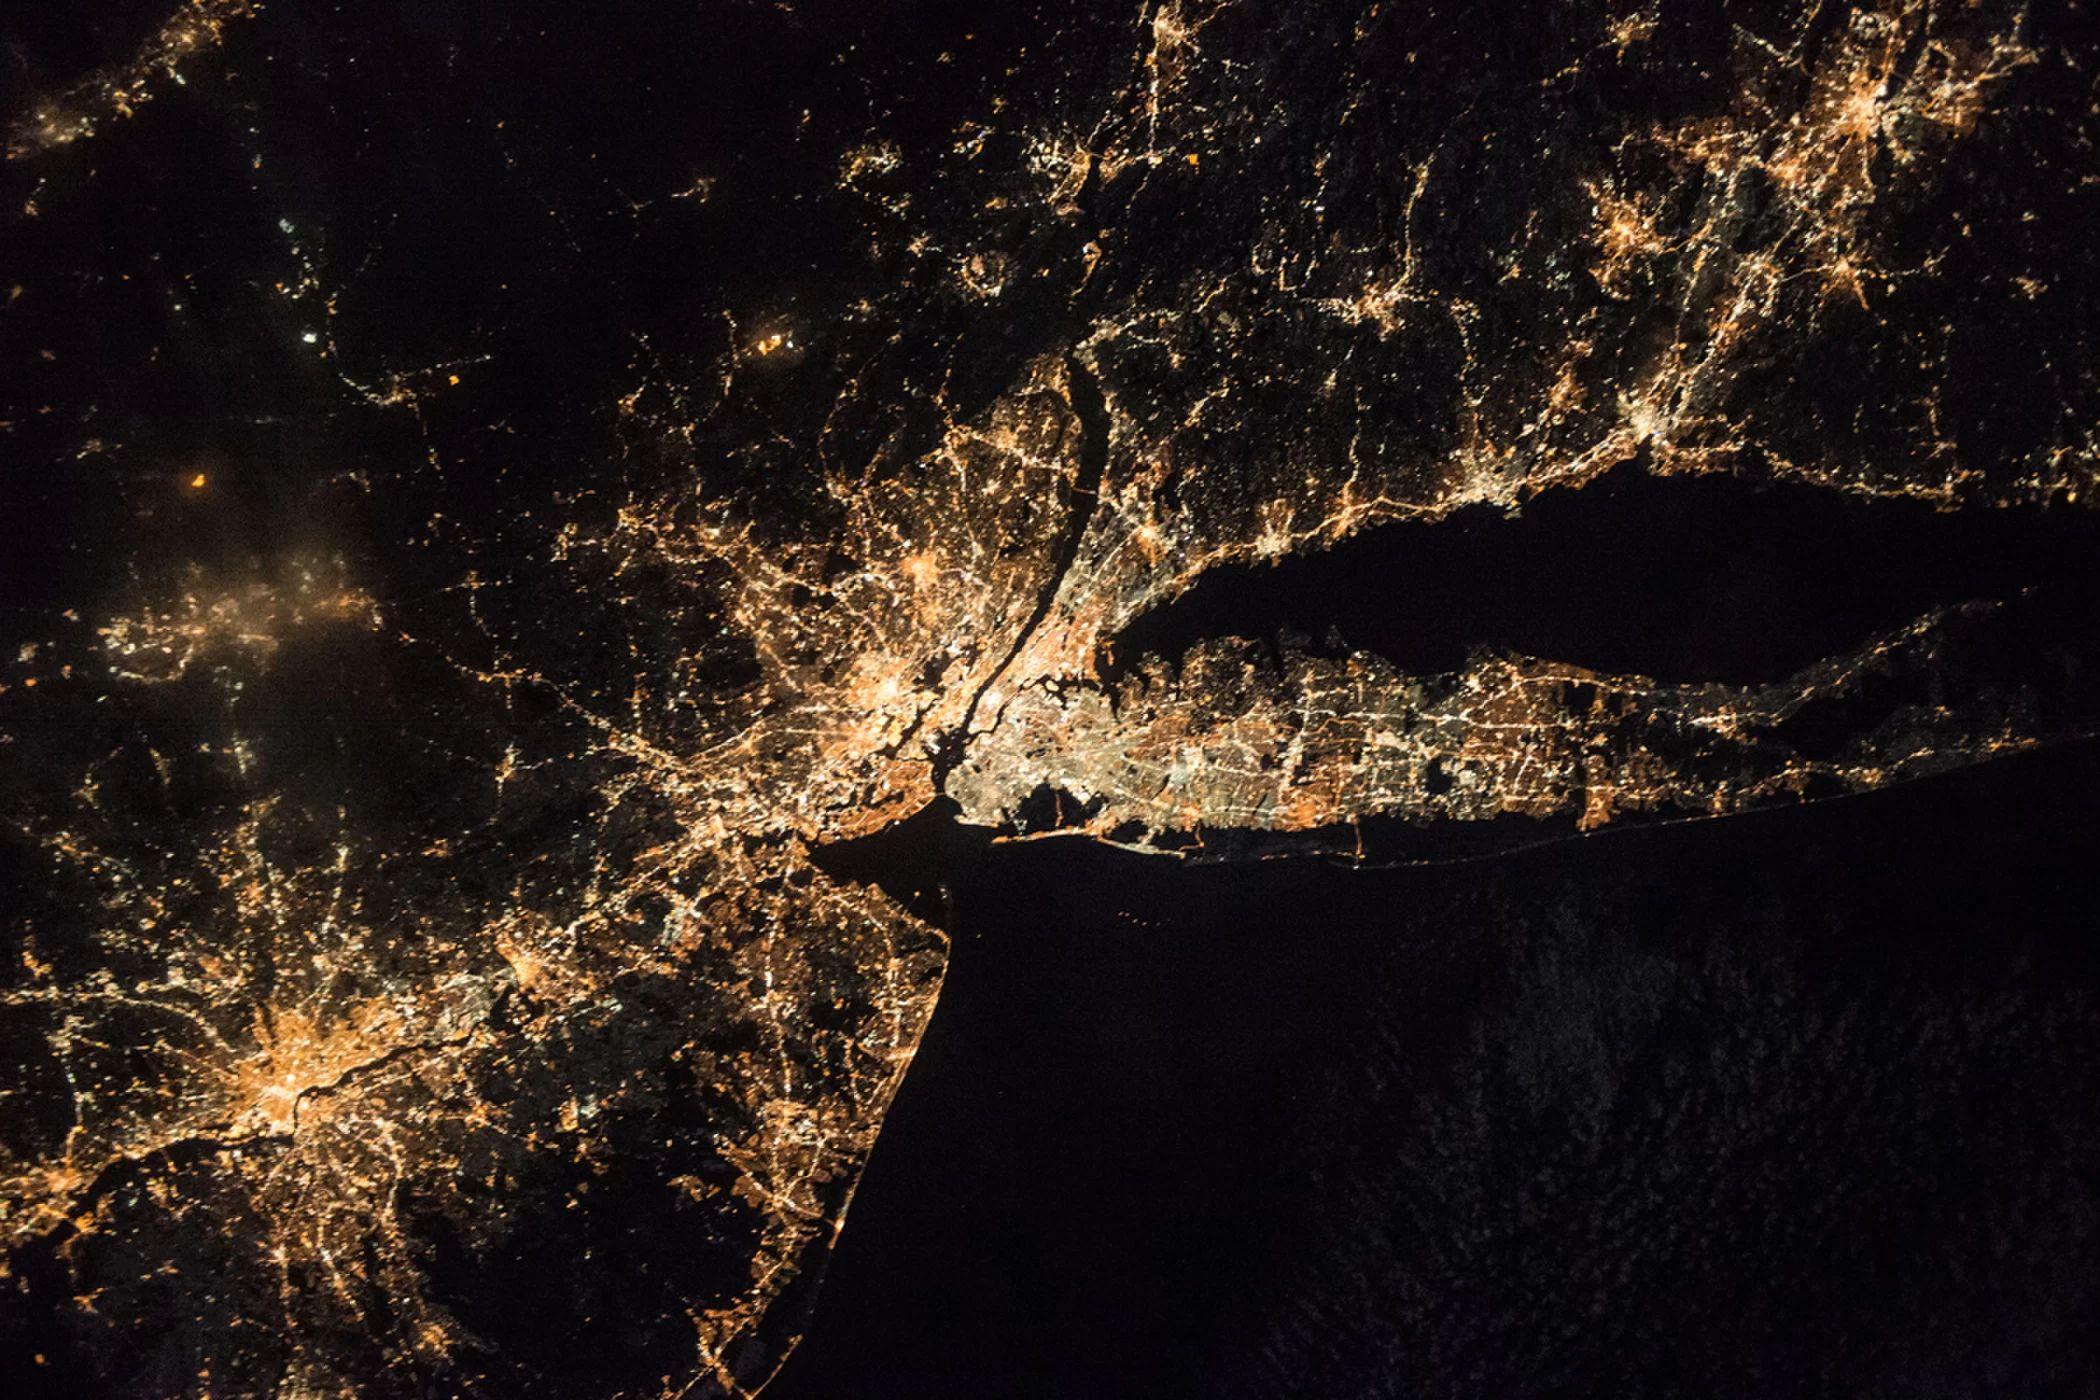 Explore NASA Goddard Space Flight Centers 6194 photos on Flickr!